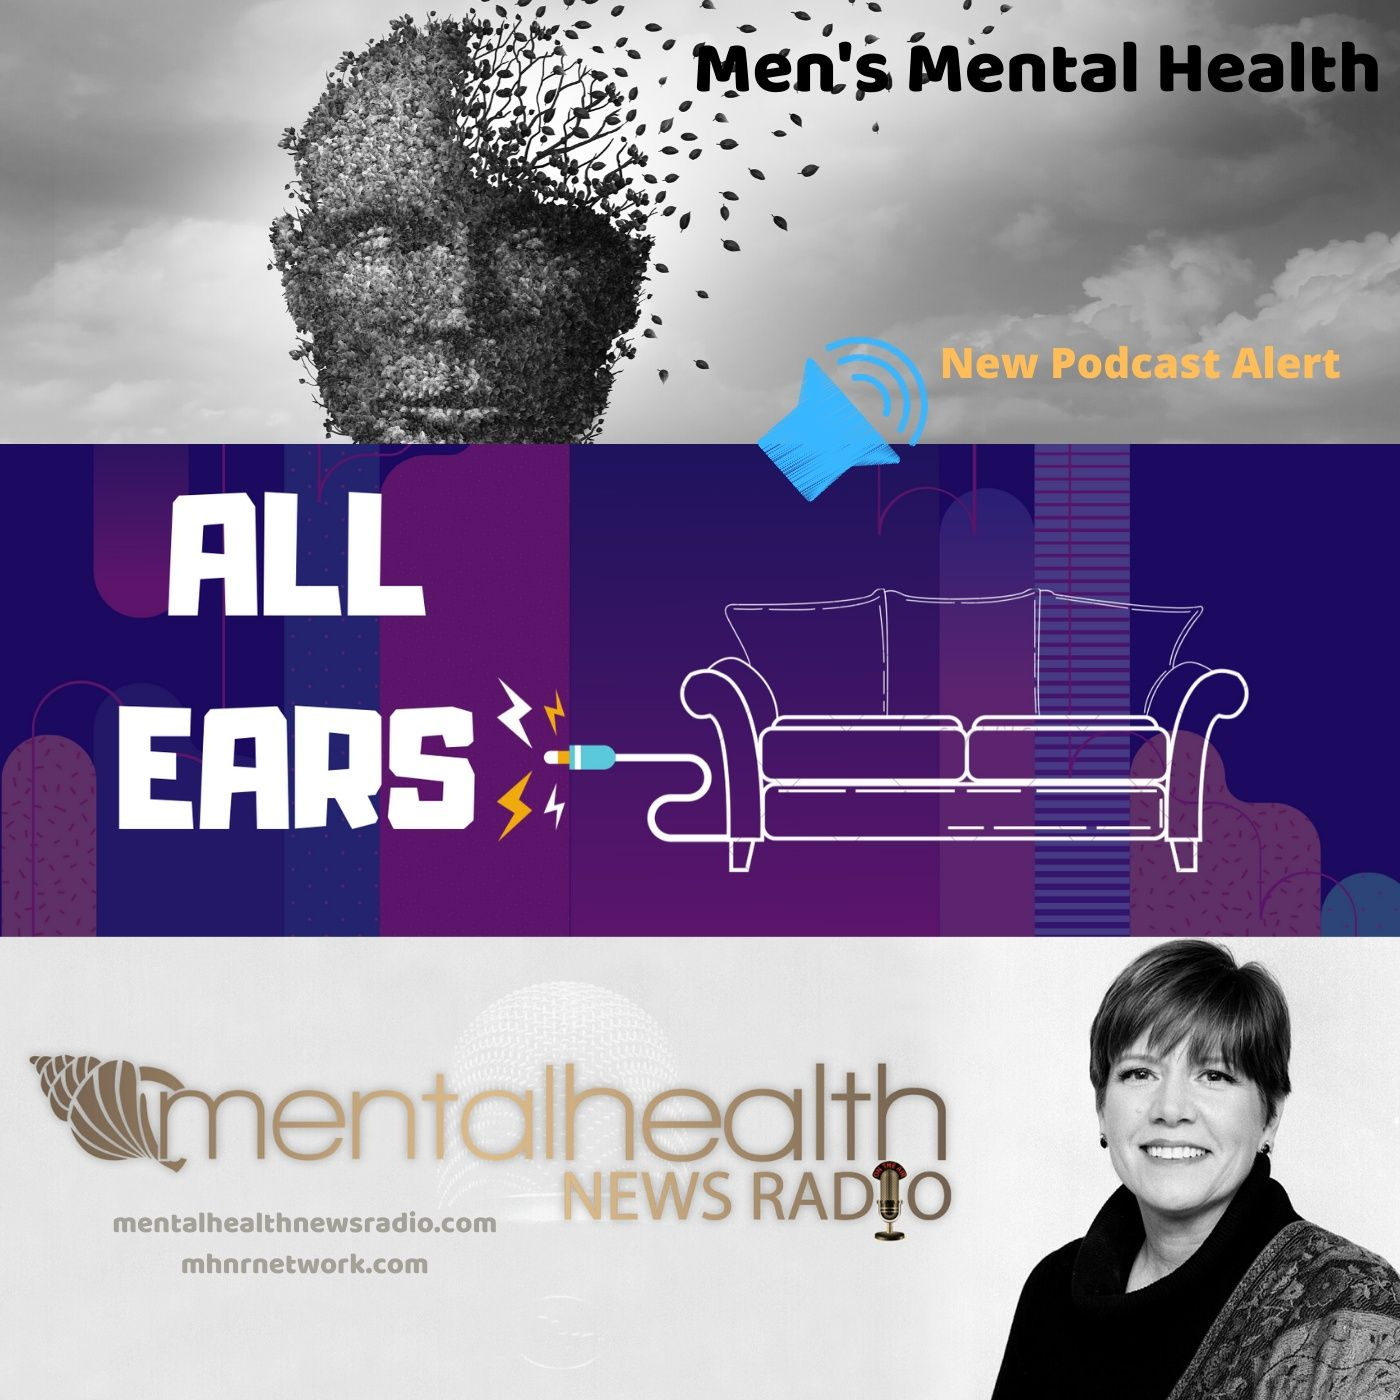 Mental Health News Radio - All Ears on Men's Mental Health